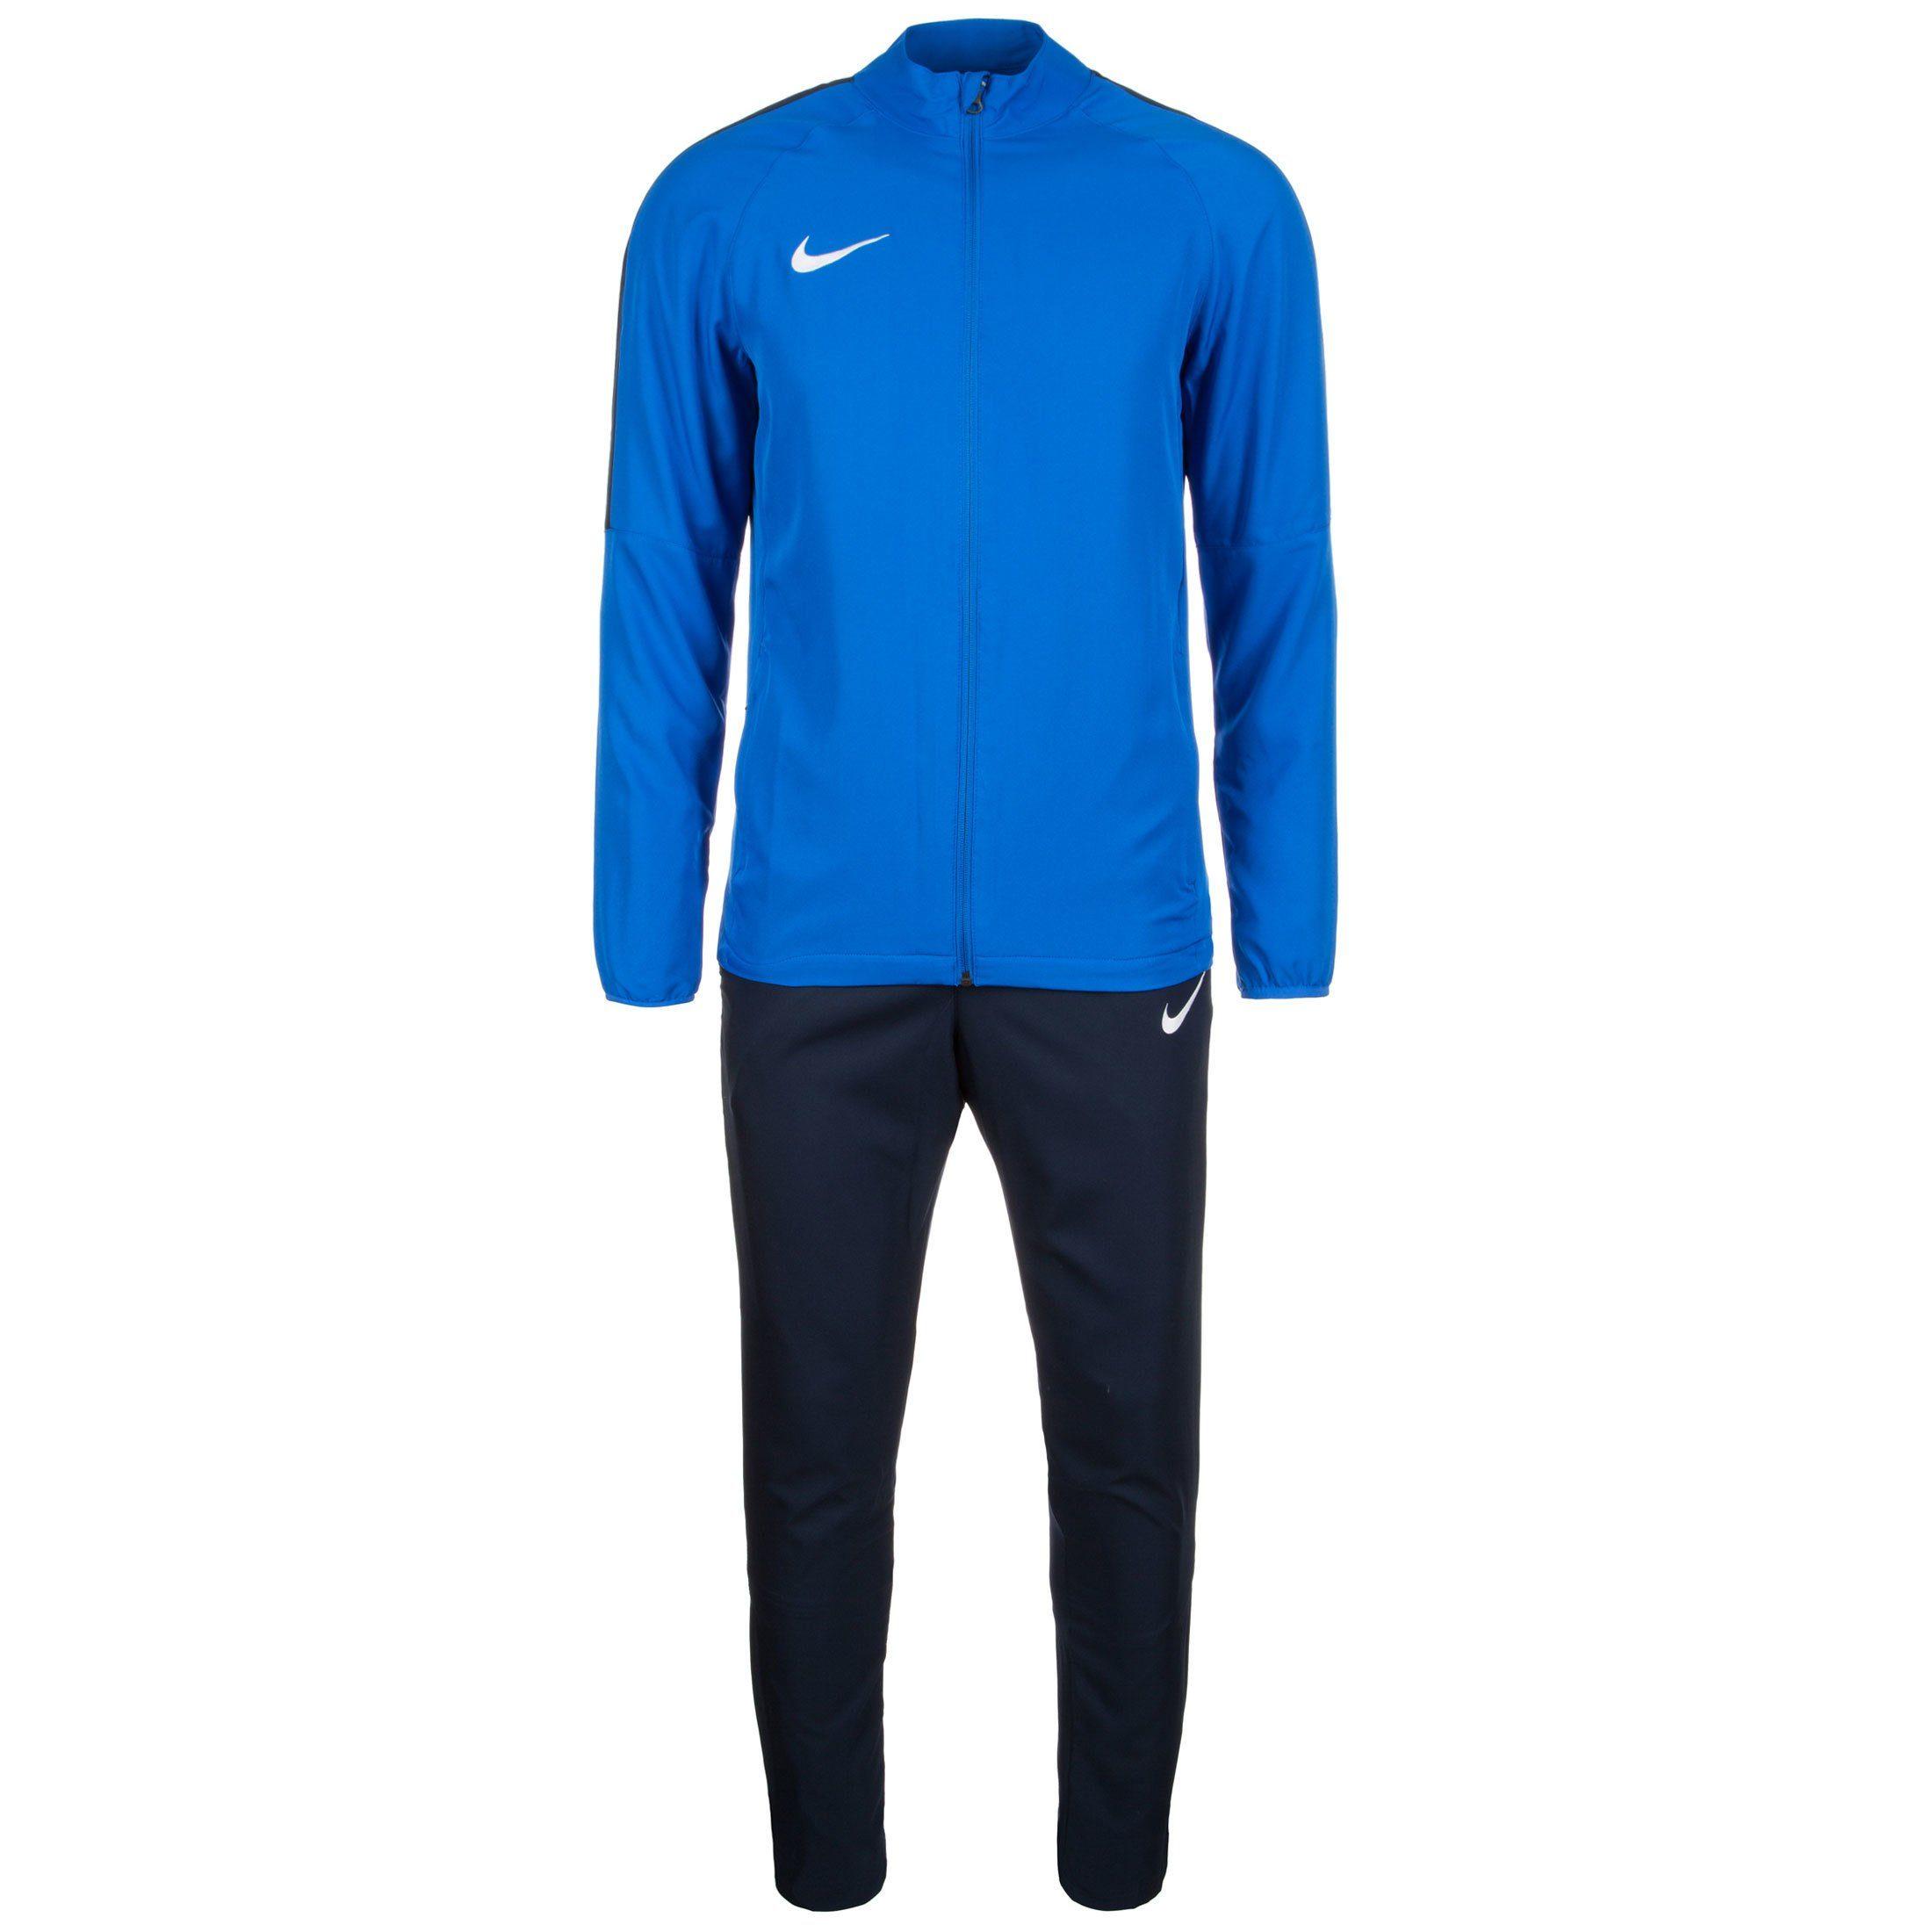 Nike Trainingsanzug »Dry Academy 18« | Sportbekleidung > Sportanzüge > Trainingsanzüge | Blau | Nike